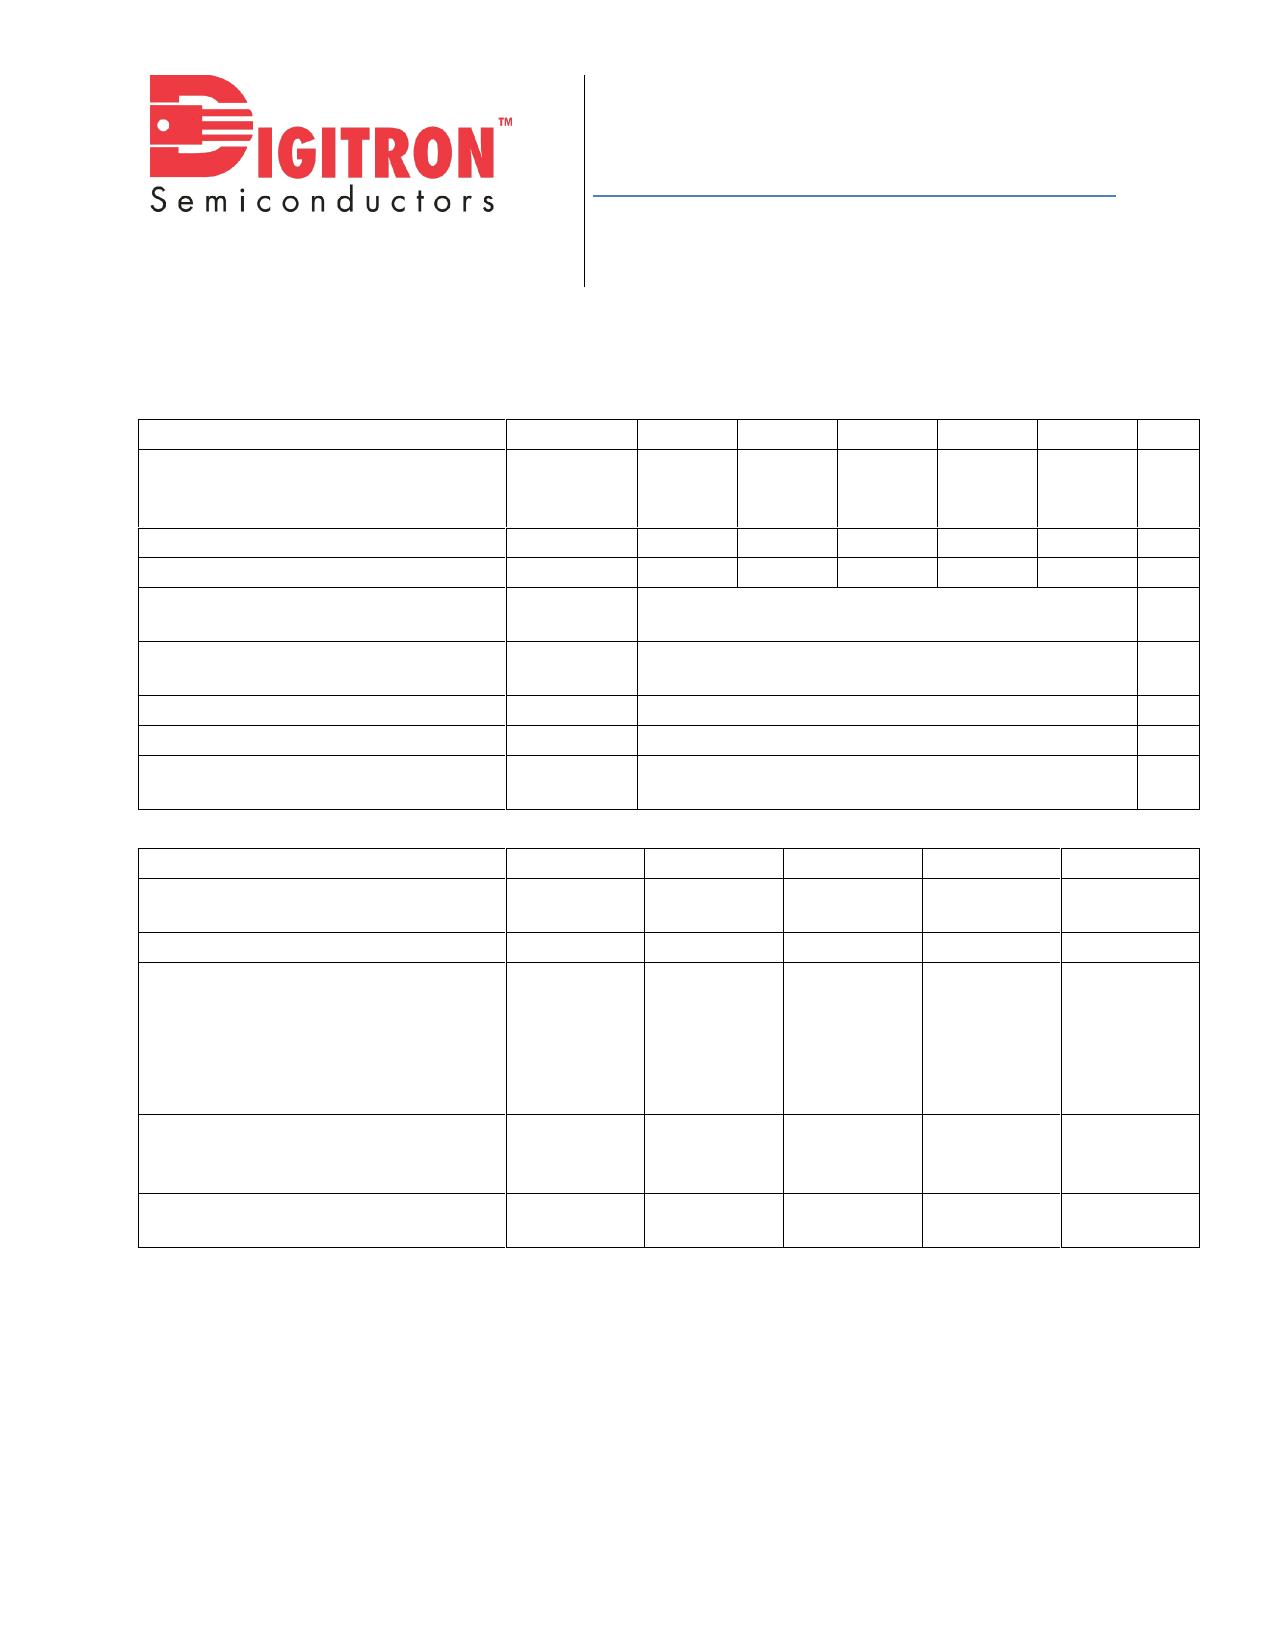 MR854 데이터시트 및 MR854 PDF